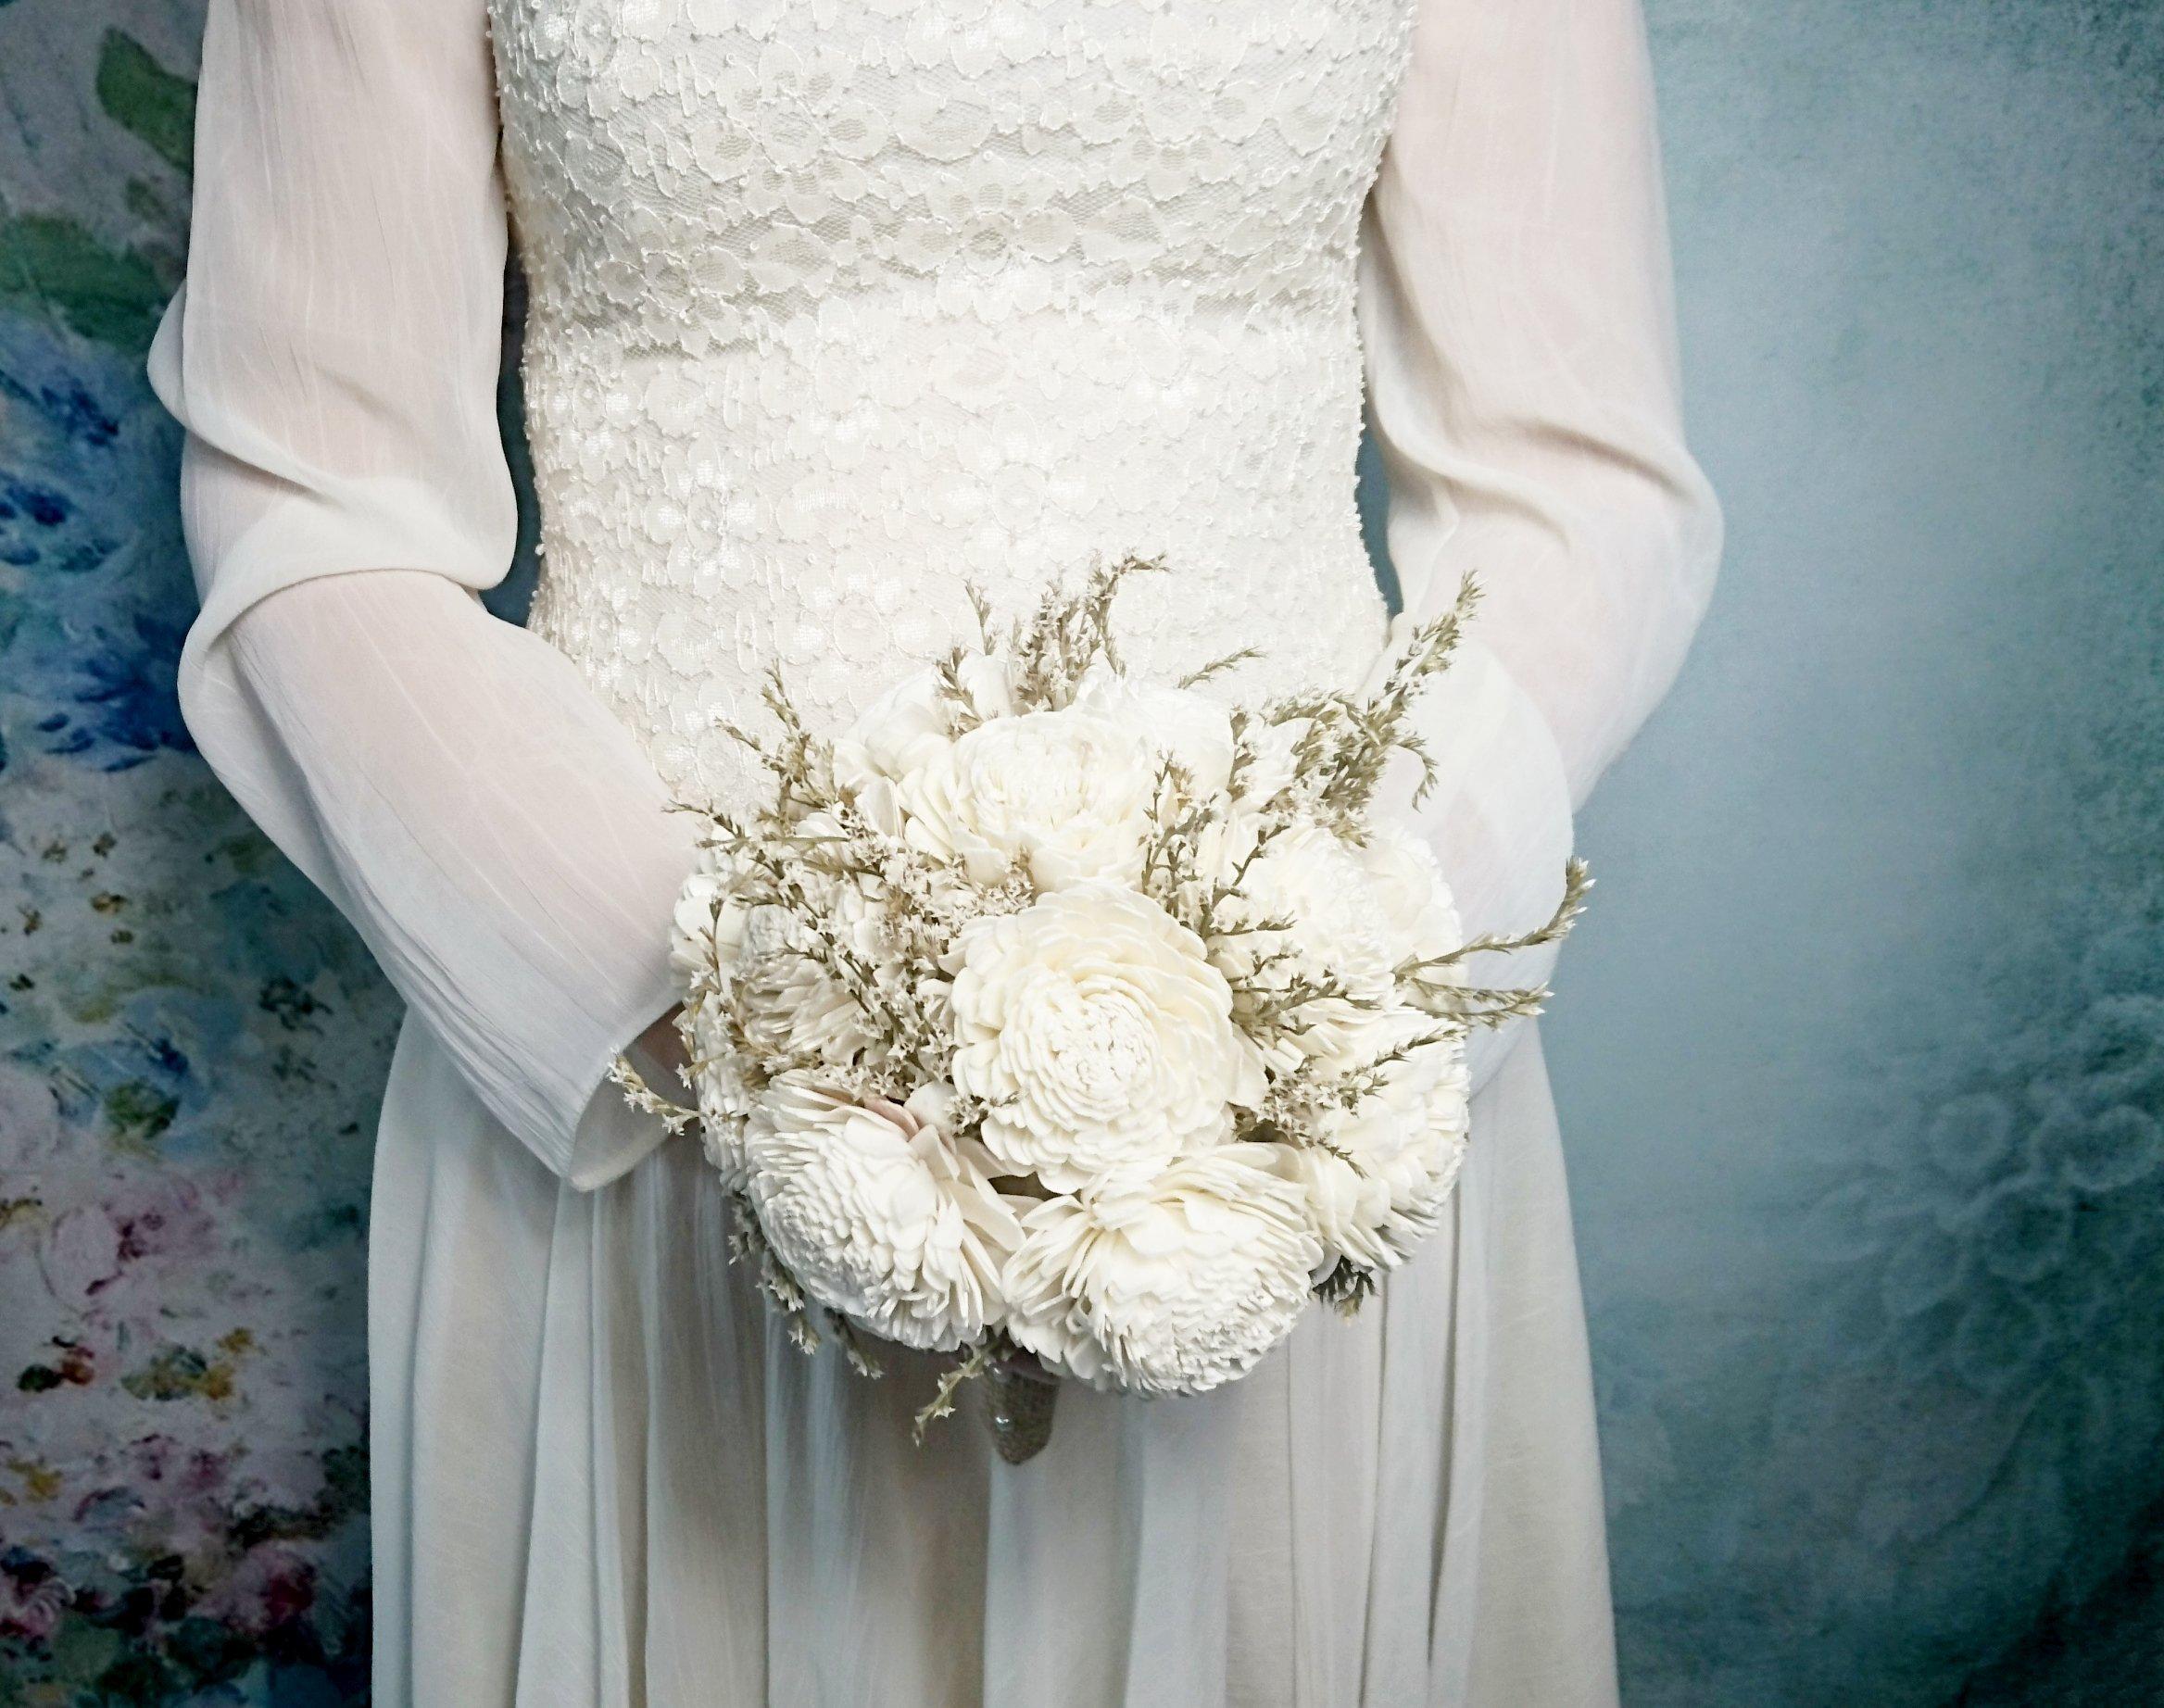 Medium Ivory Rustic Sola Flowers Wedding Bouquet